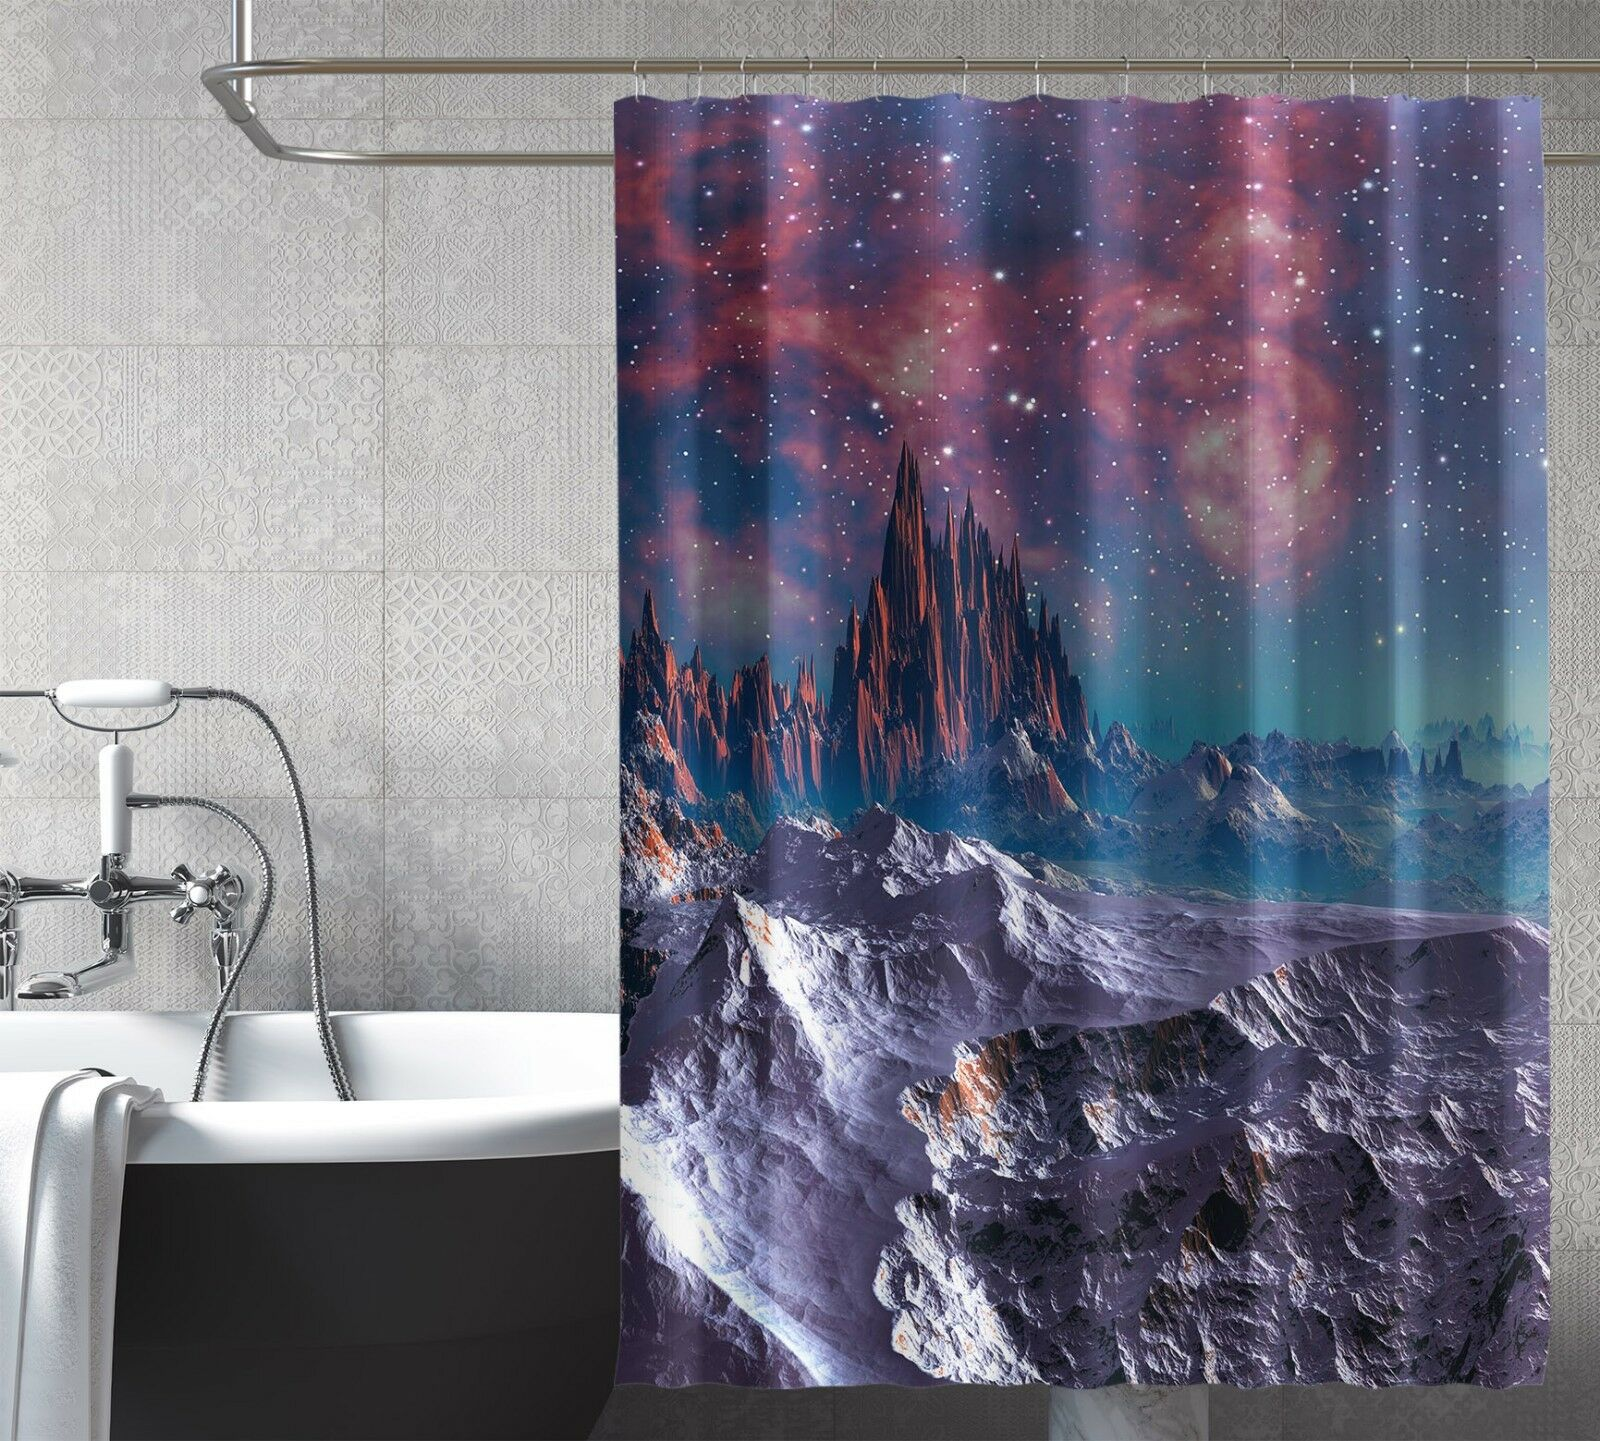 3D Starry Hills  8 Shower Shower Shower Curtain Waterproof Fiber Bathroom Home Windows Toilet 63f735